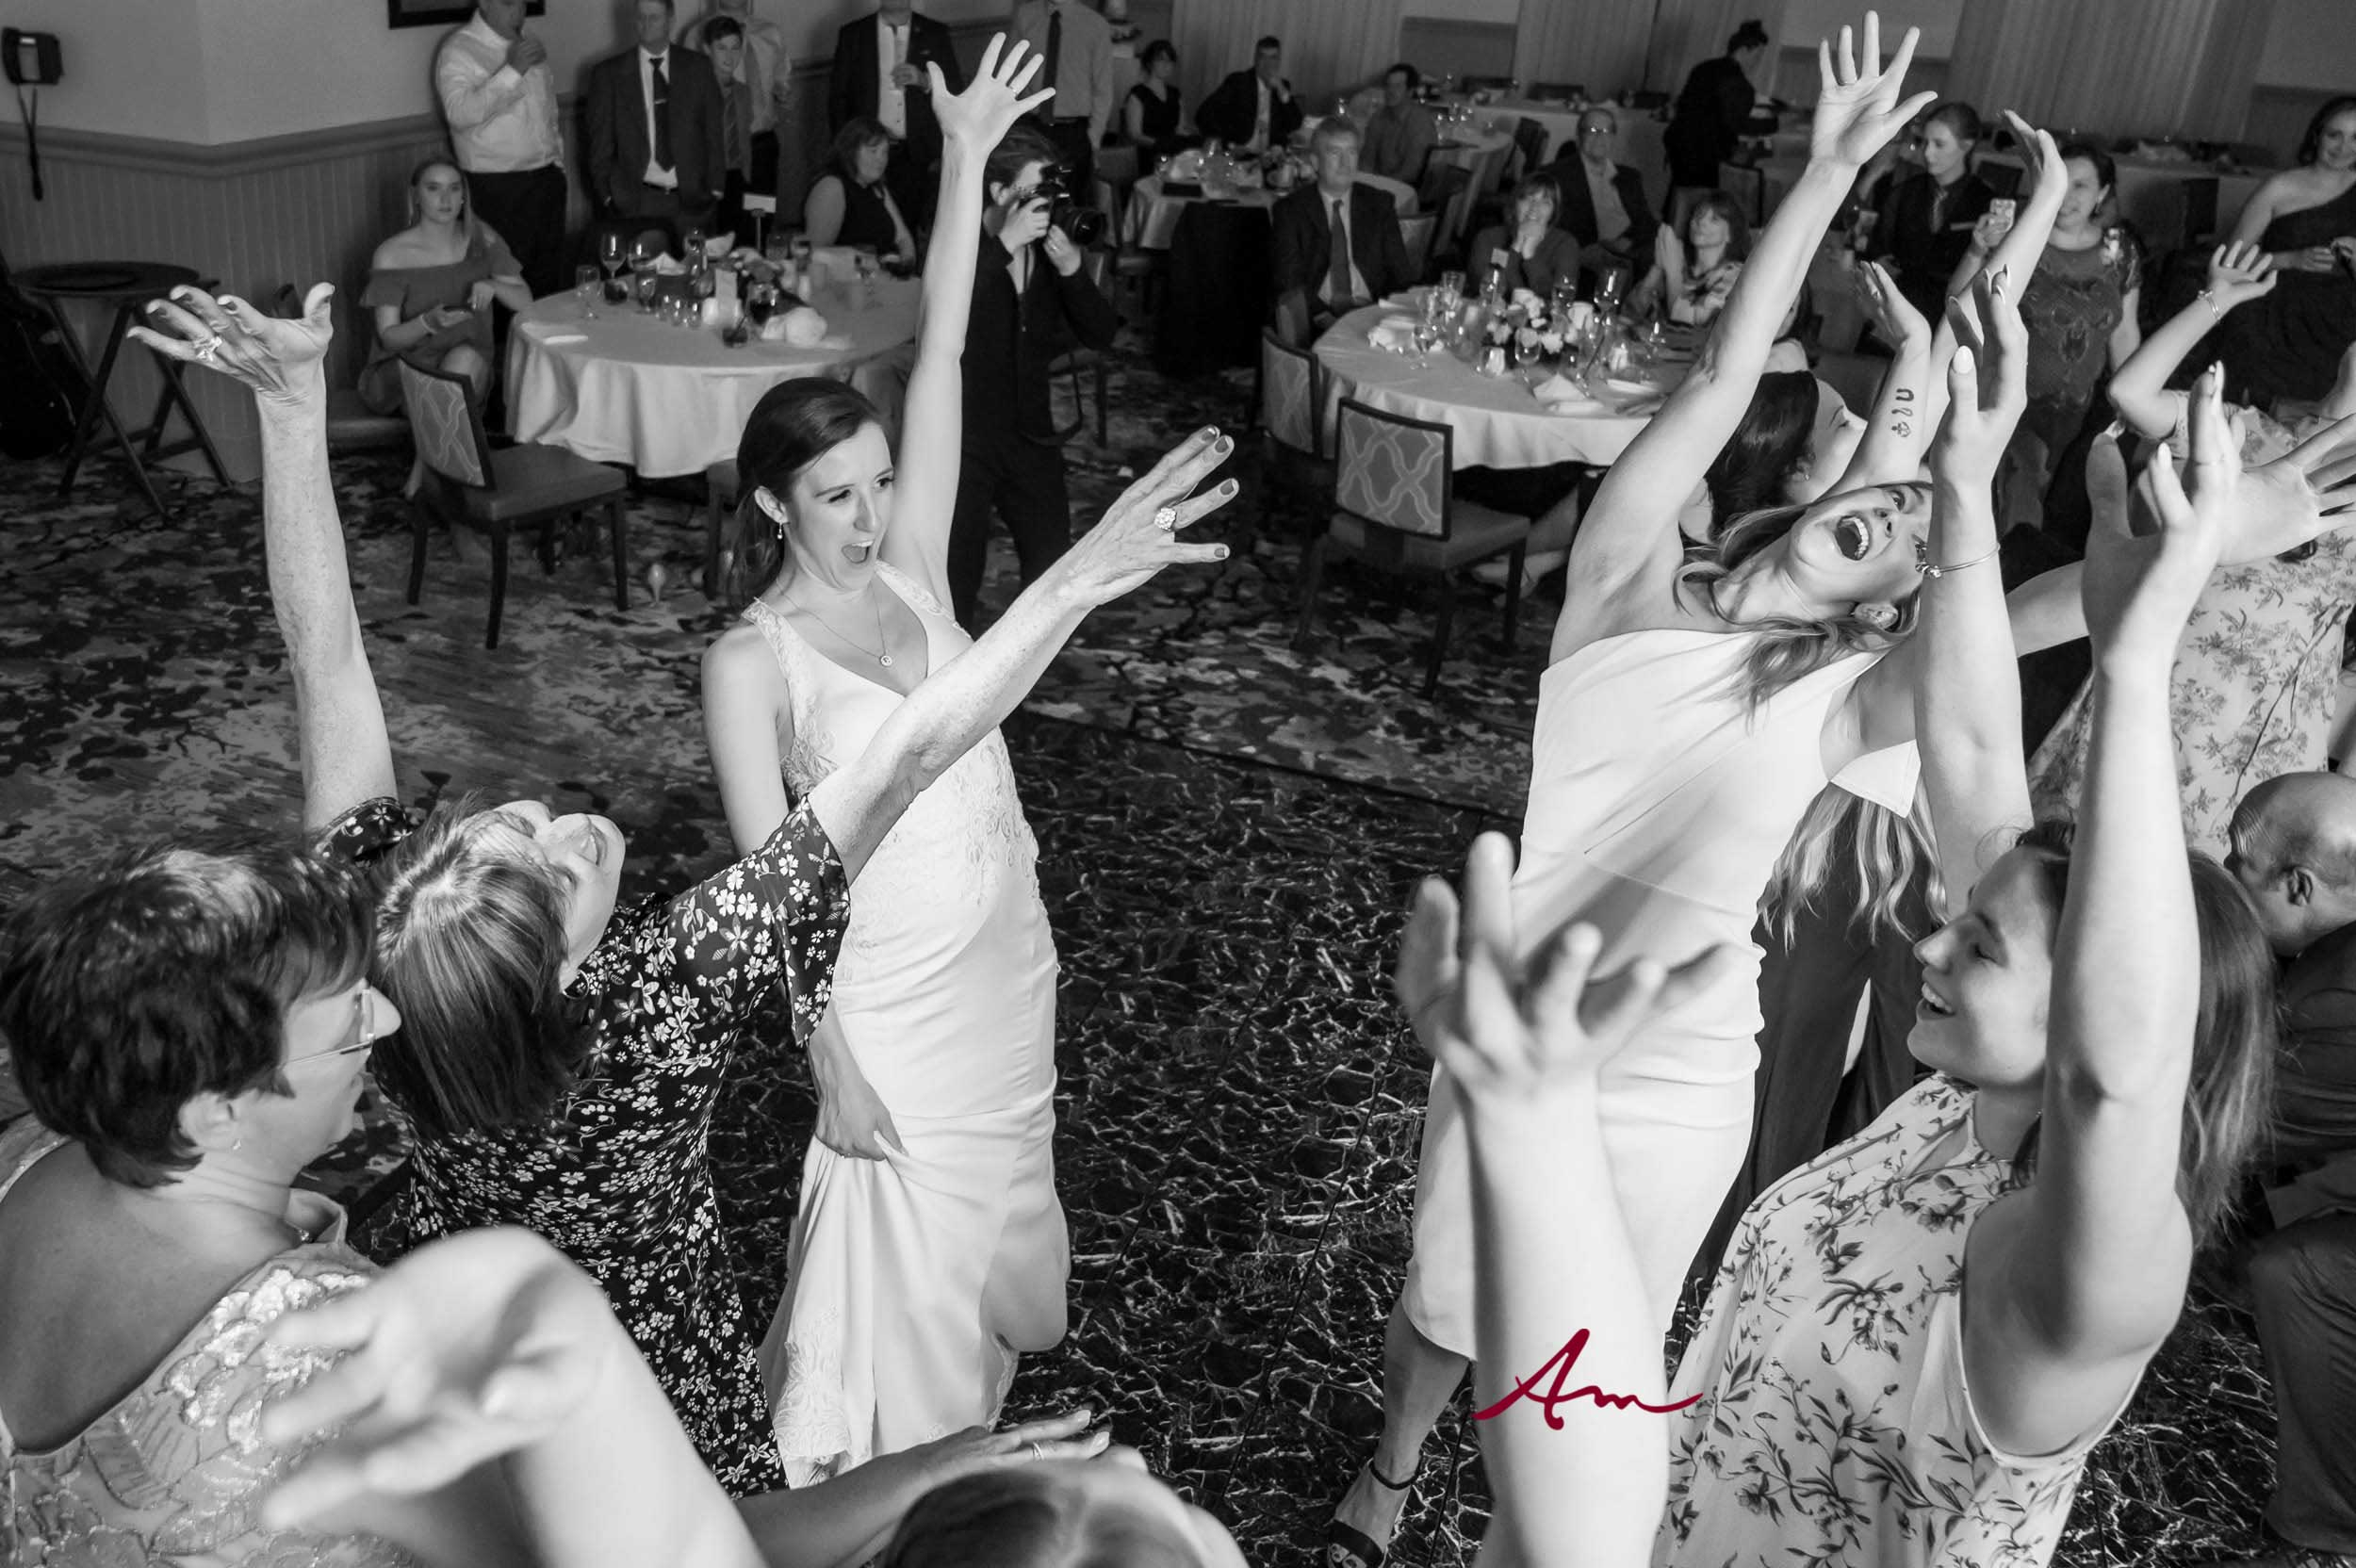 Fox-Harb'r-Wedding-Party-Dance-Floor.jpg